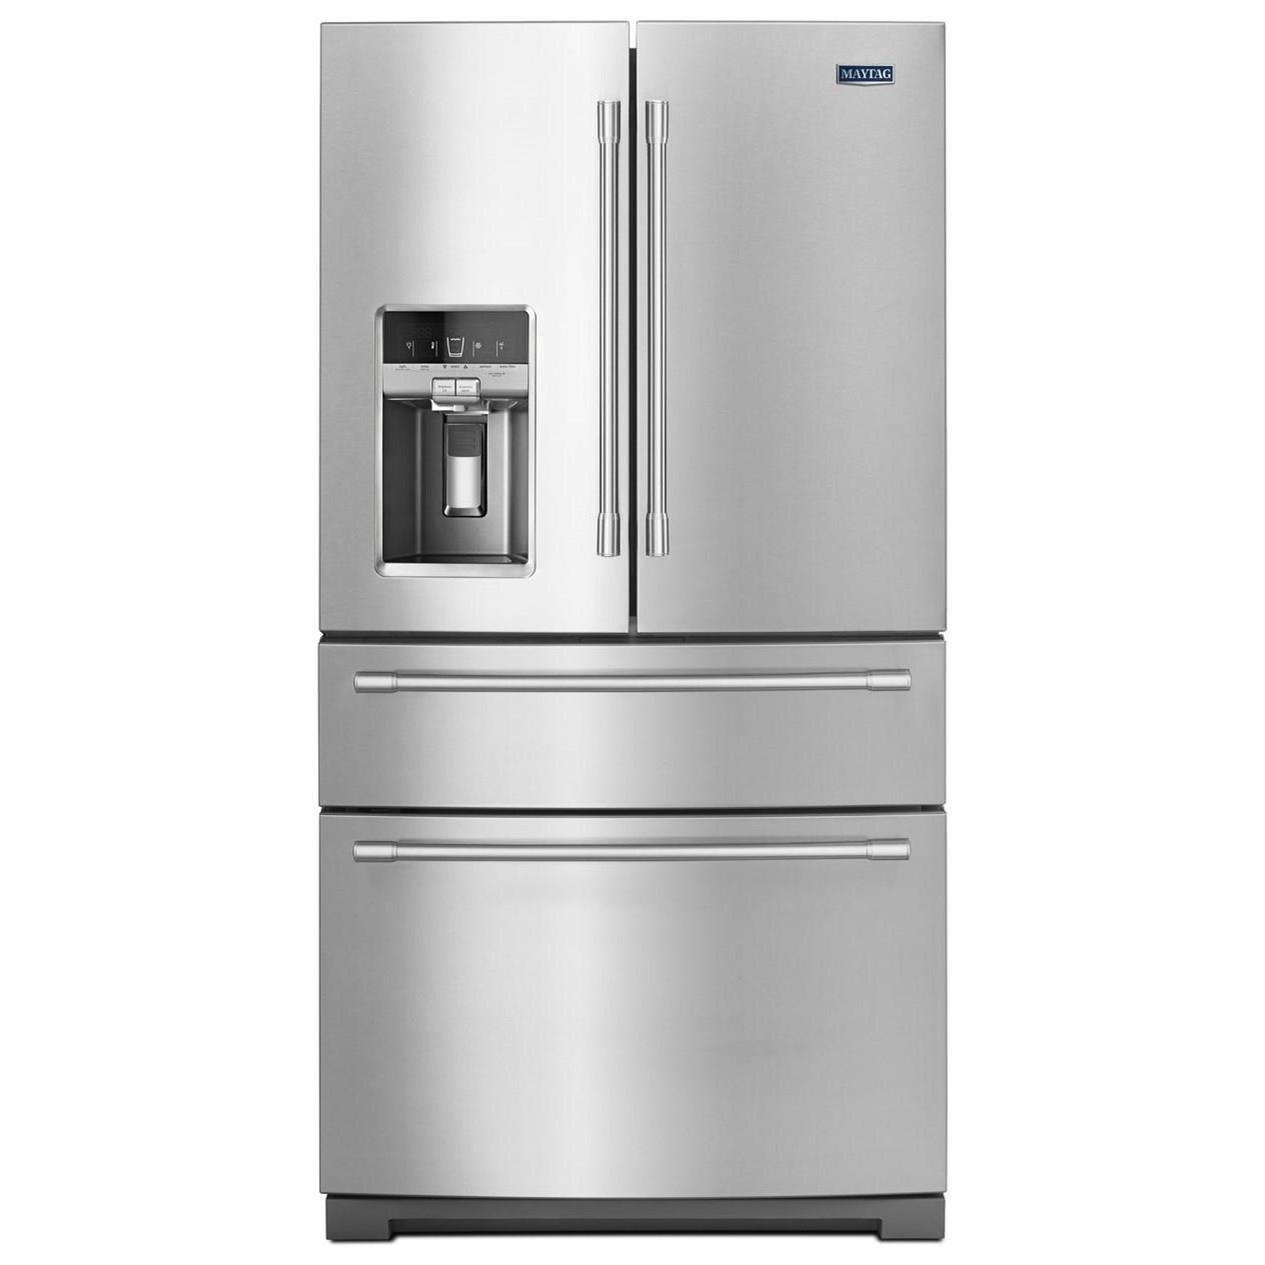 Maytag 36 Inch Wide 4 Door French Door Refrigerator With